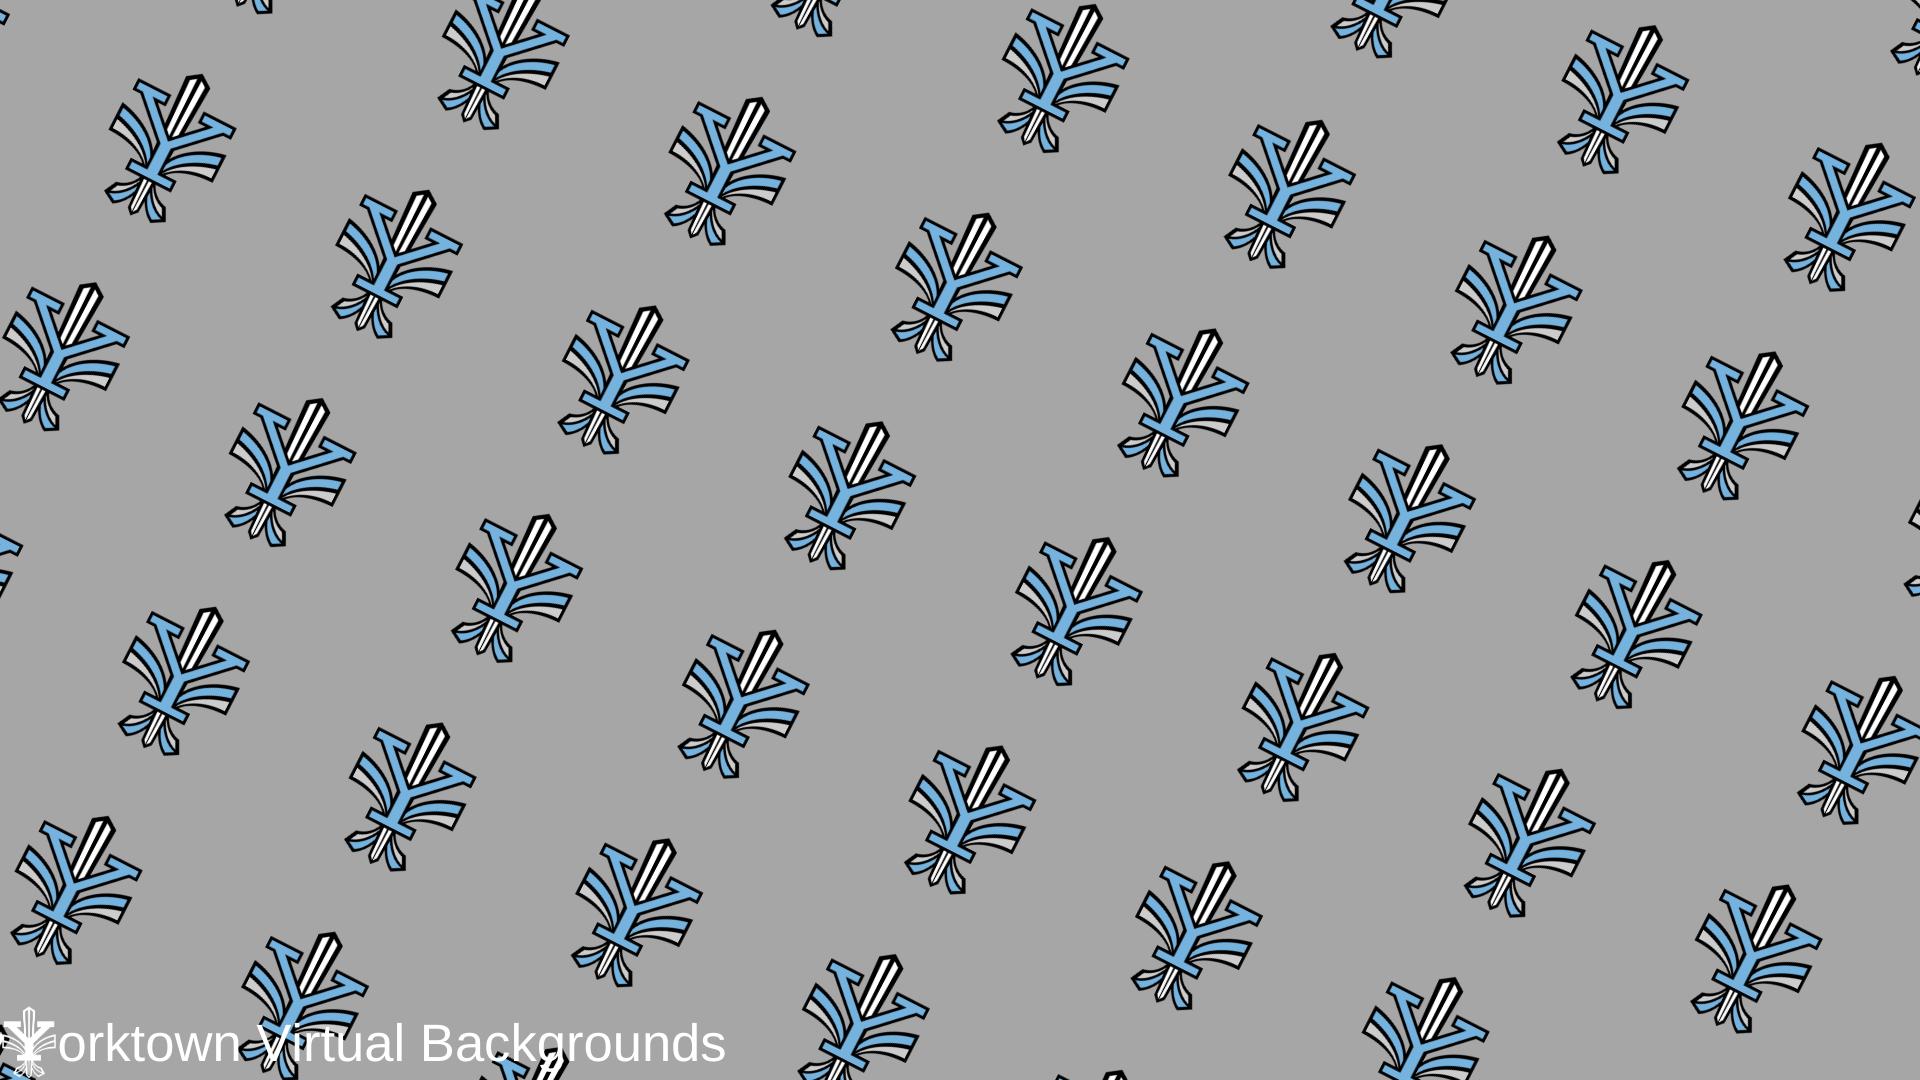 Yorktown Logo Wallpaper for Teams - Grey - Diagonal